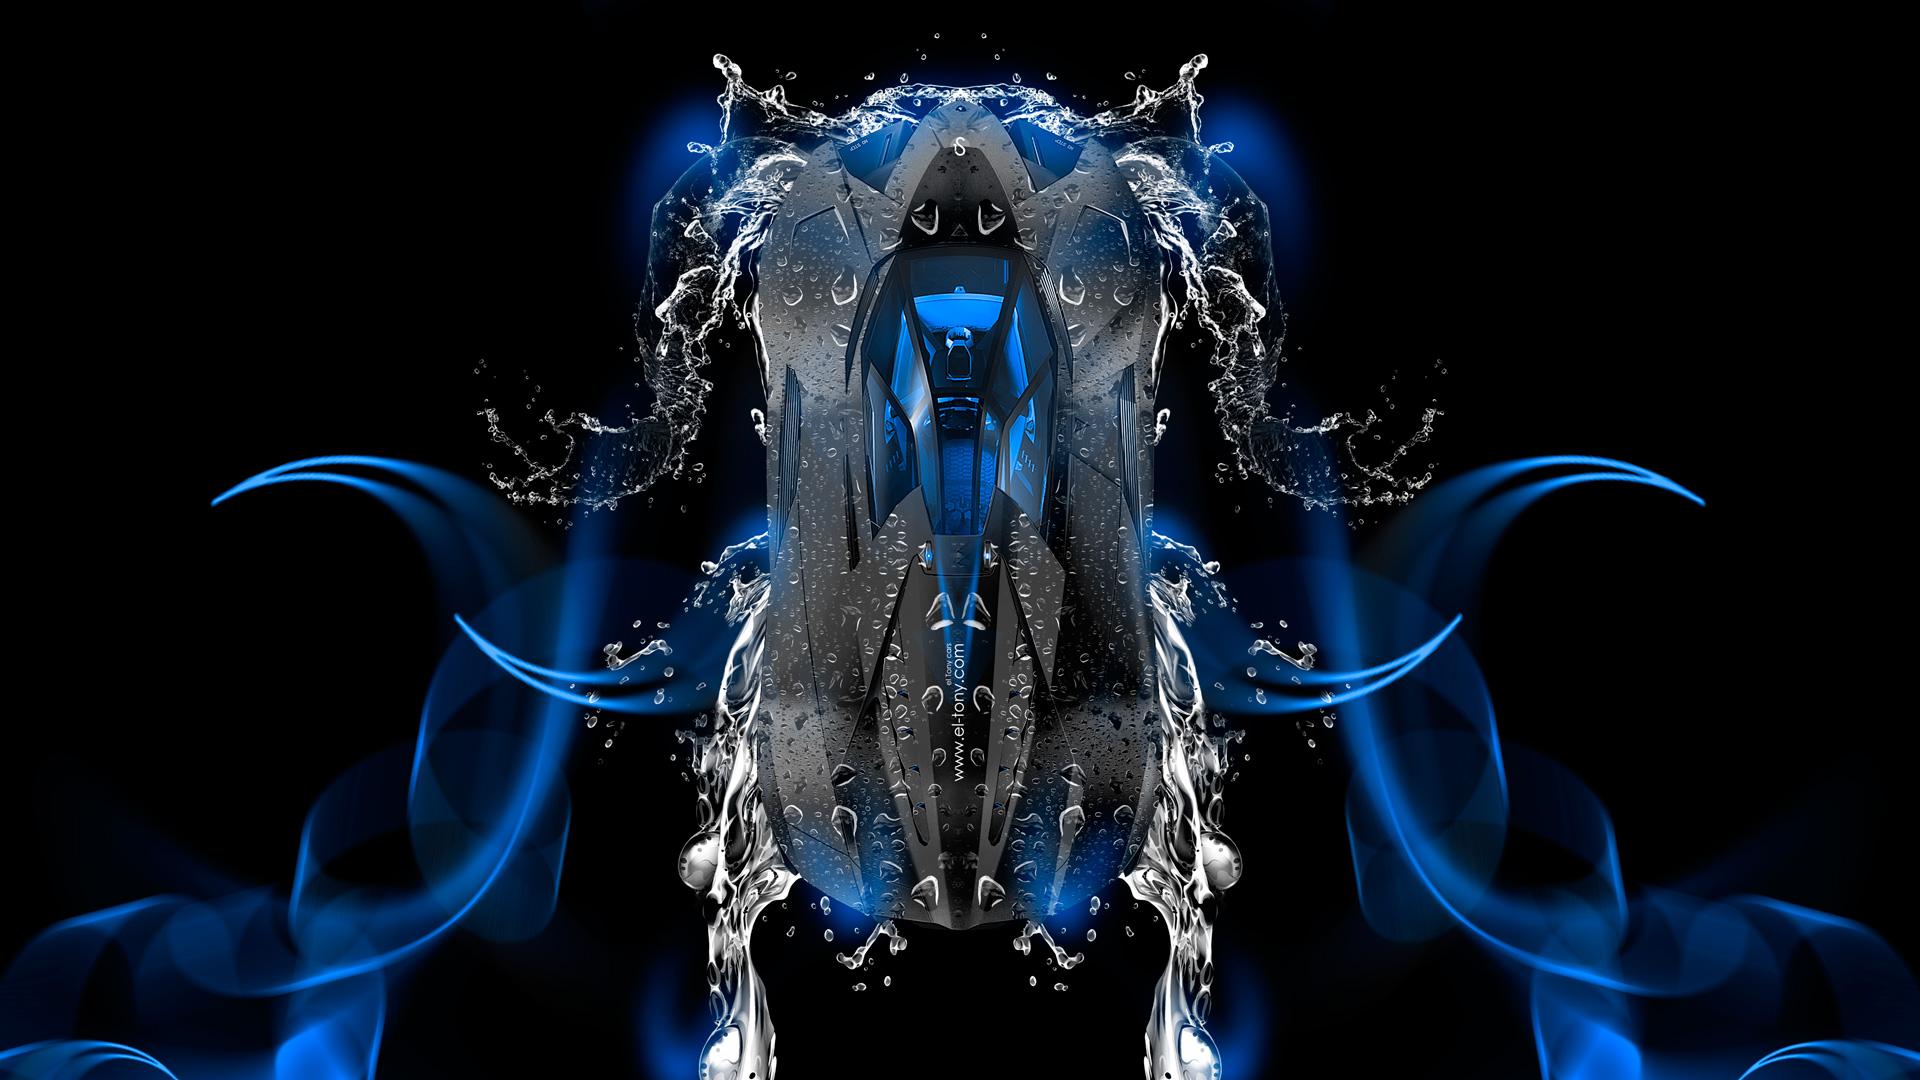 Lamborghini Egoista Up Super Water Car 2014 Blue Neon Hd Wallpapers